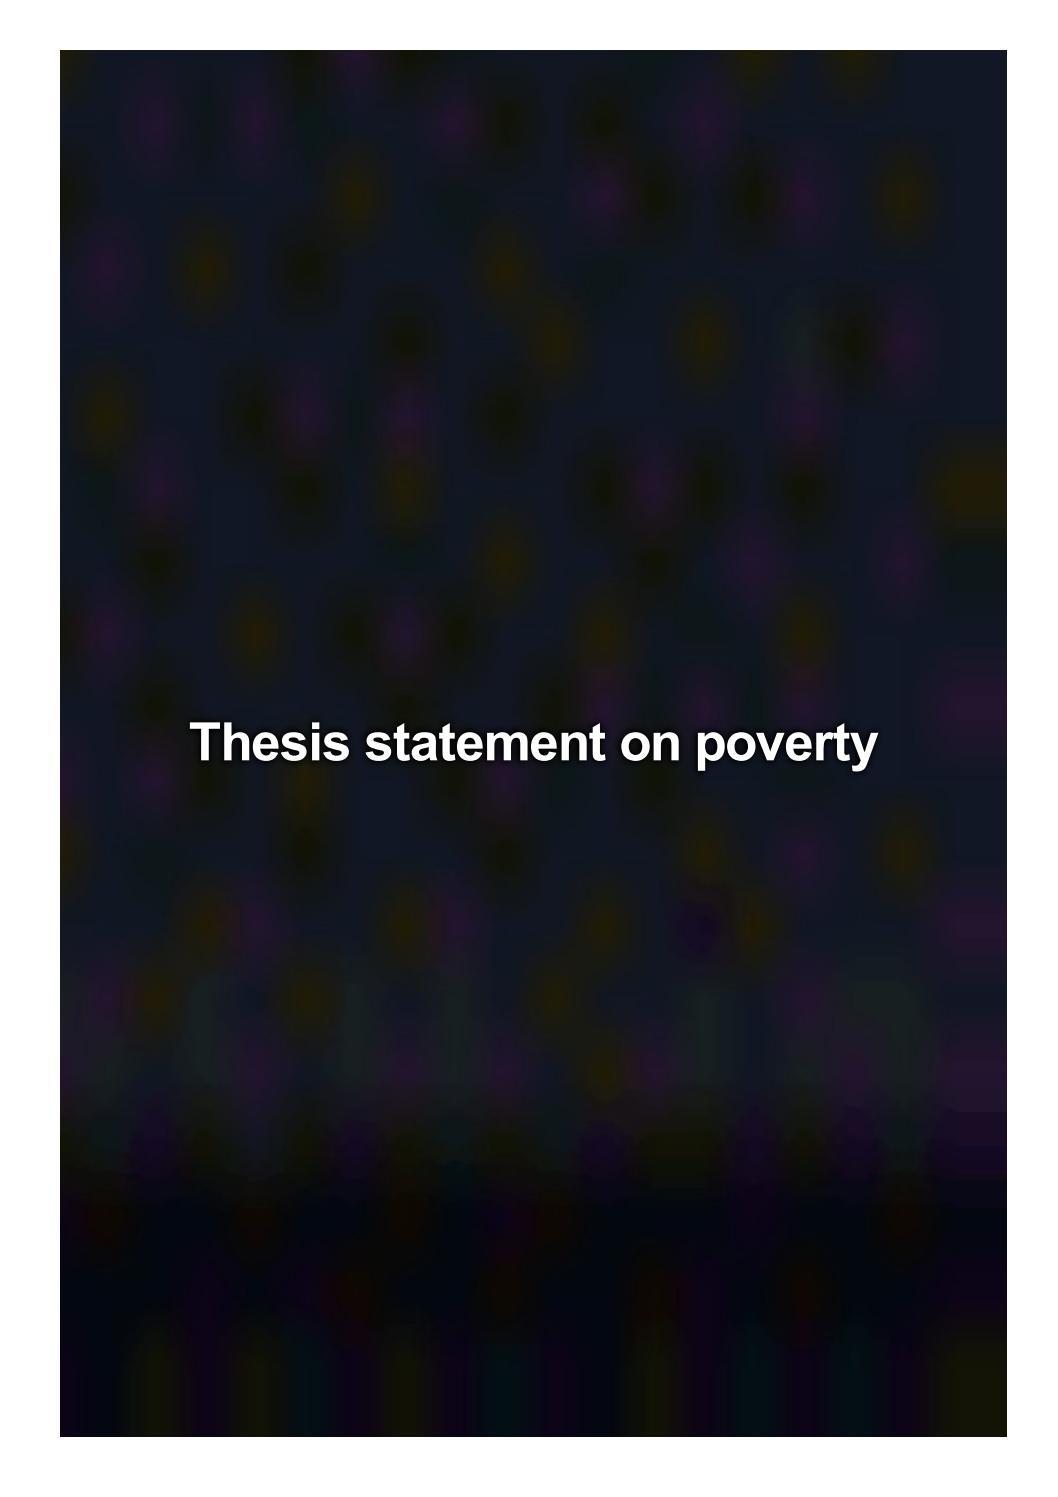 thesis poverty